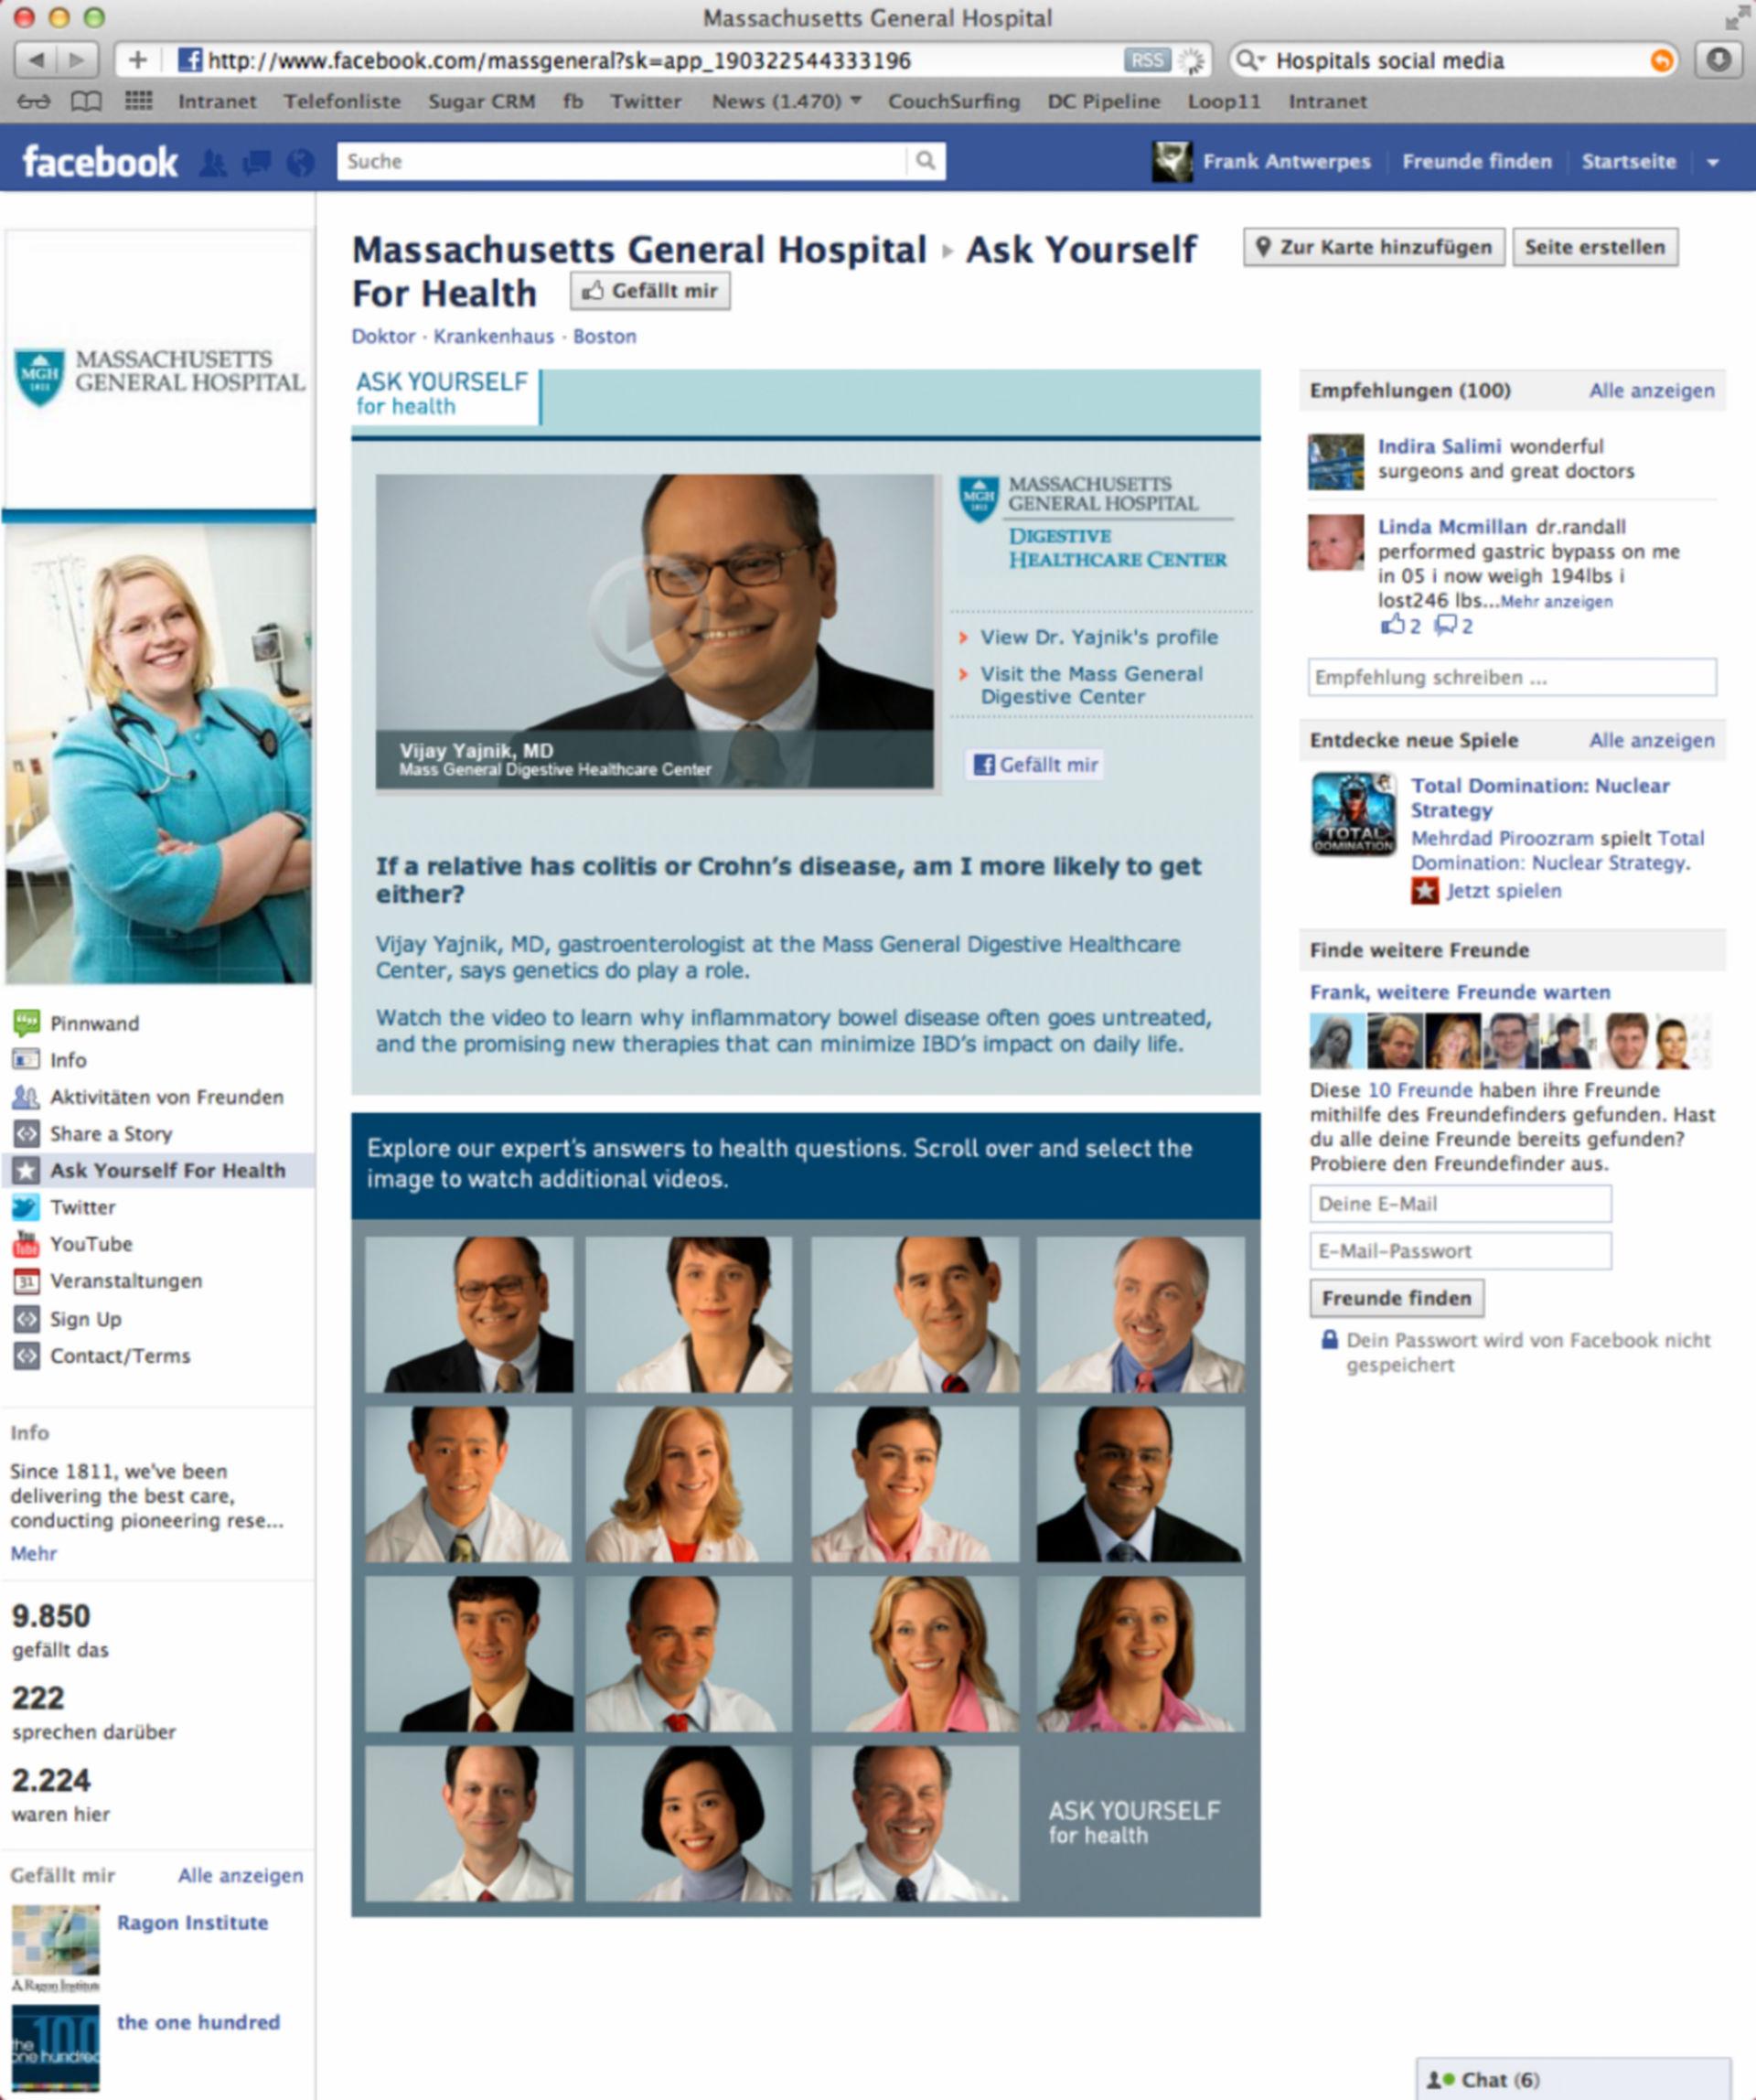 MassGeneral Hospital Facebook